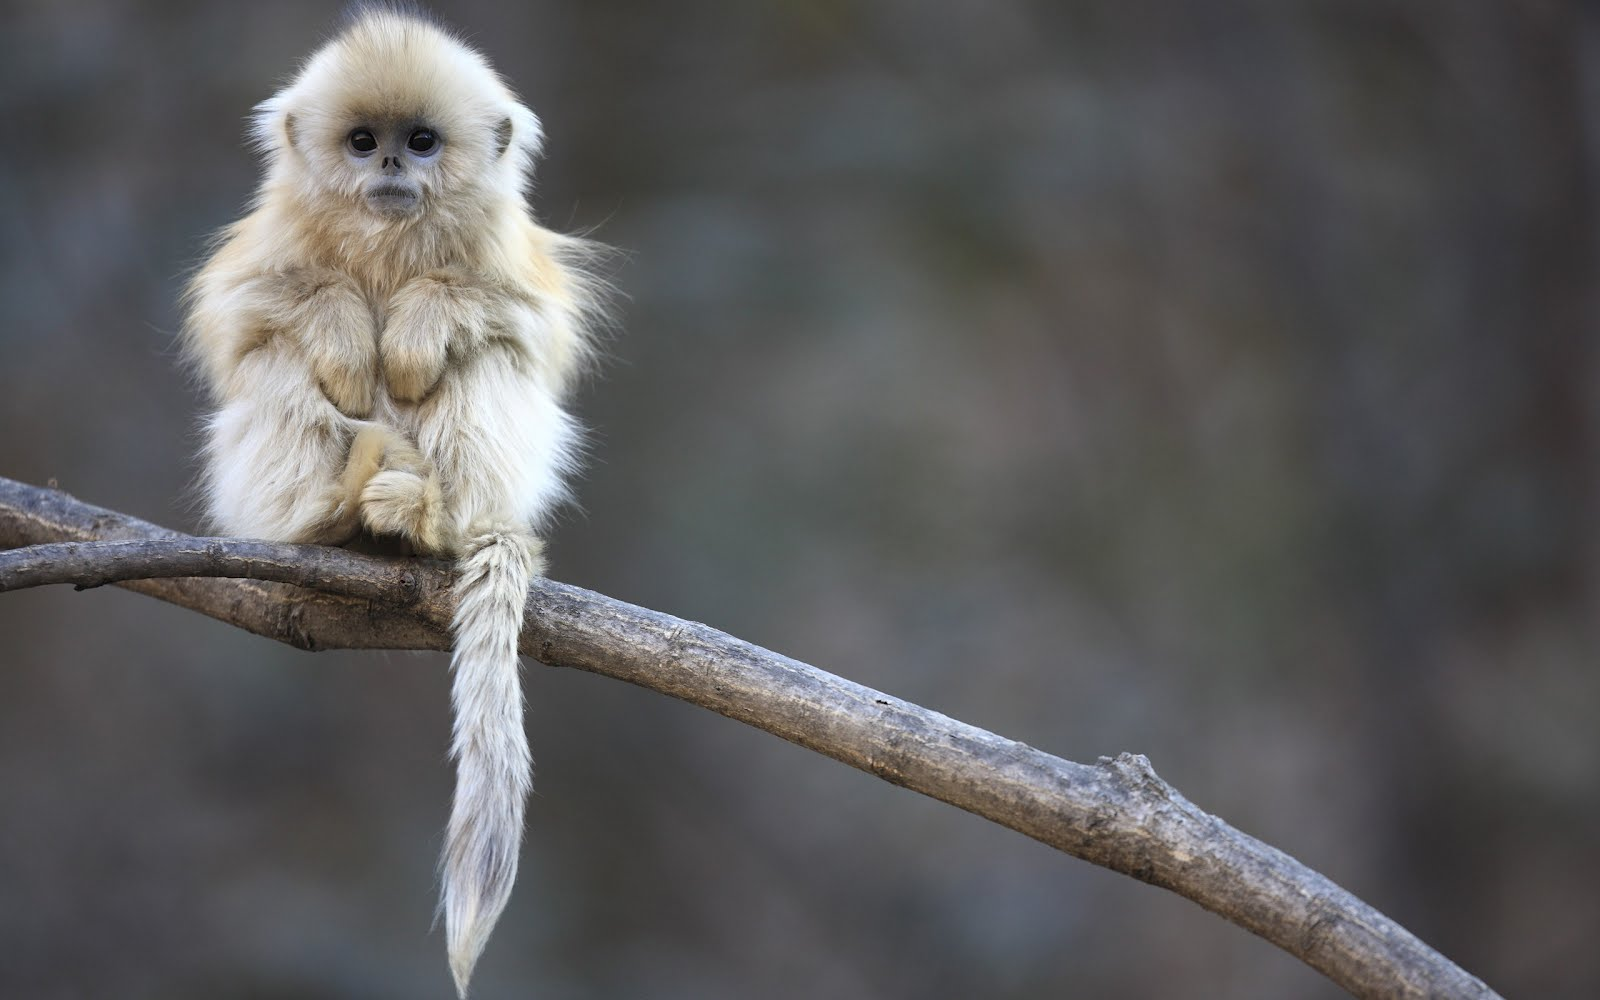 Un hermoso mono - Cute little monkey